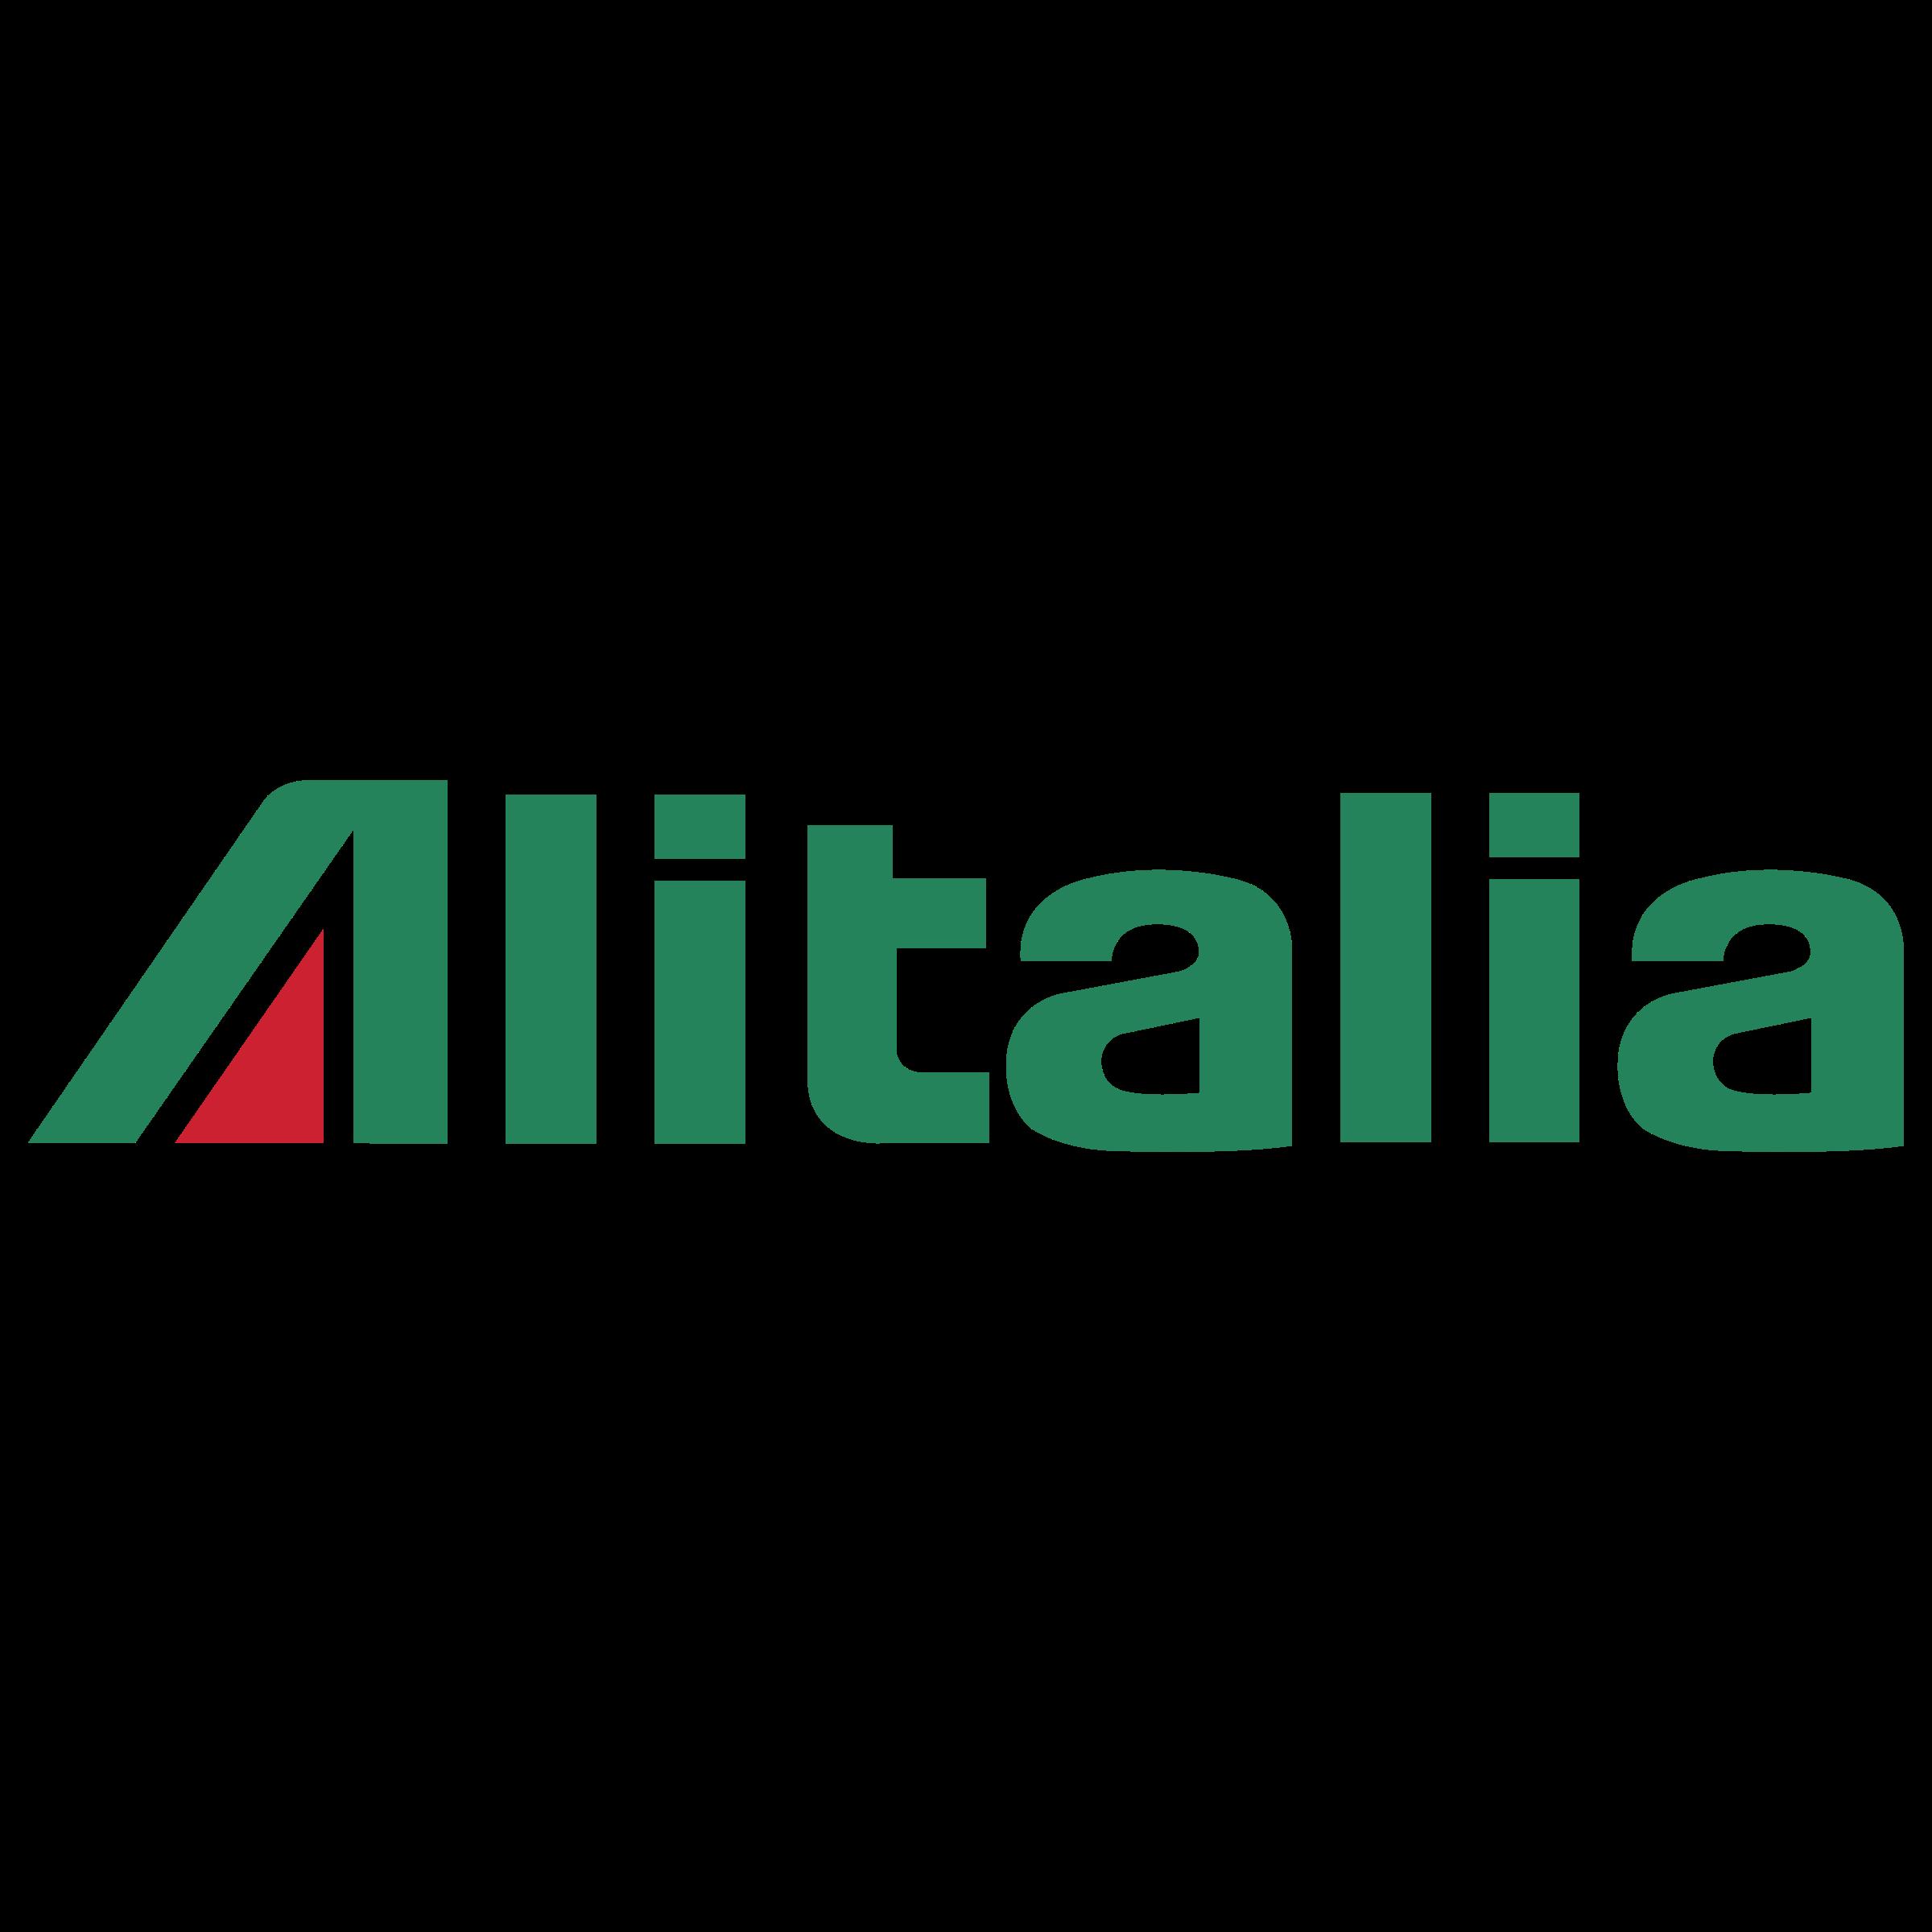 alitalia-1-logo-png-transparent